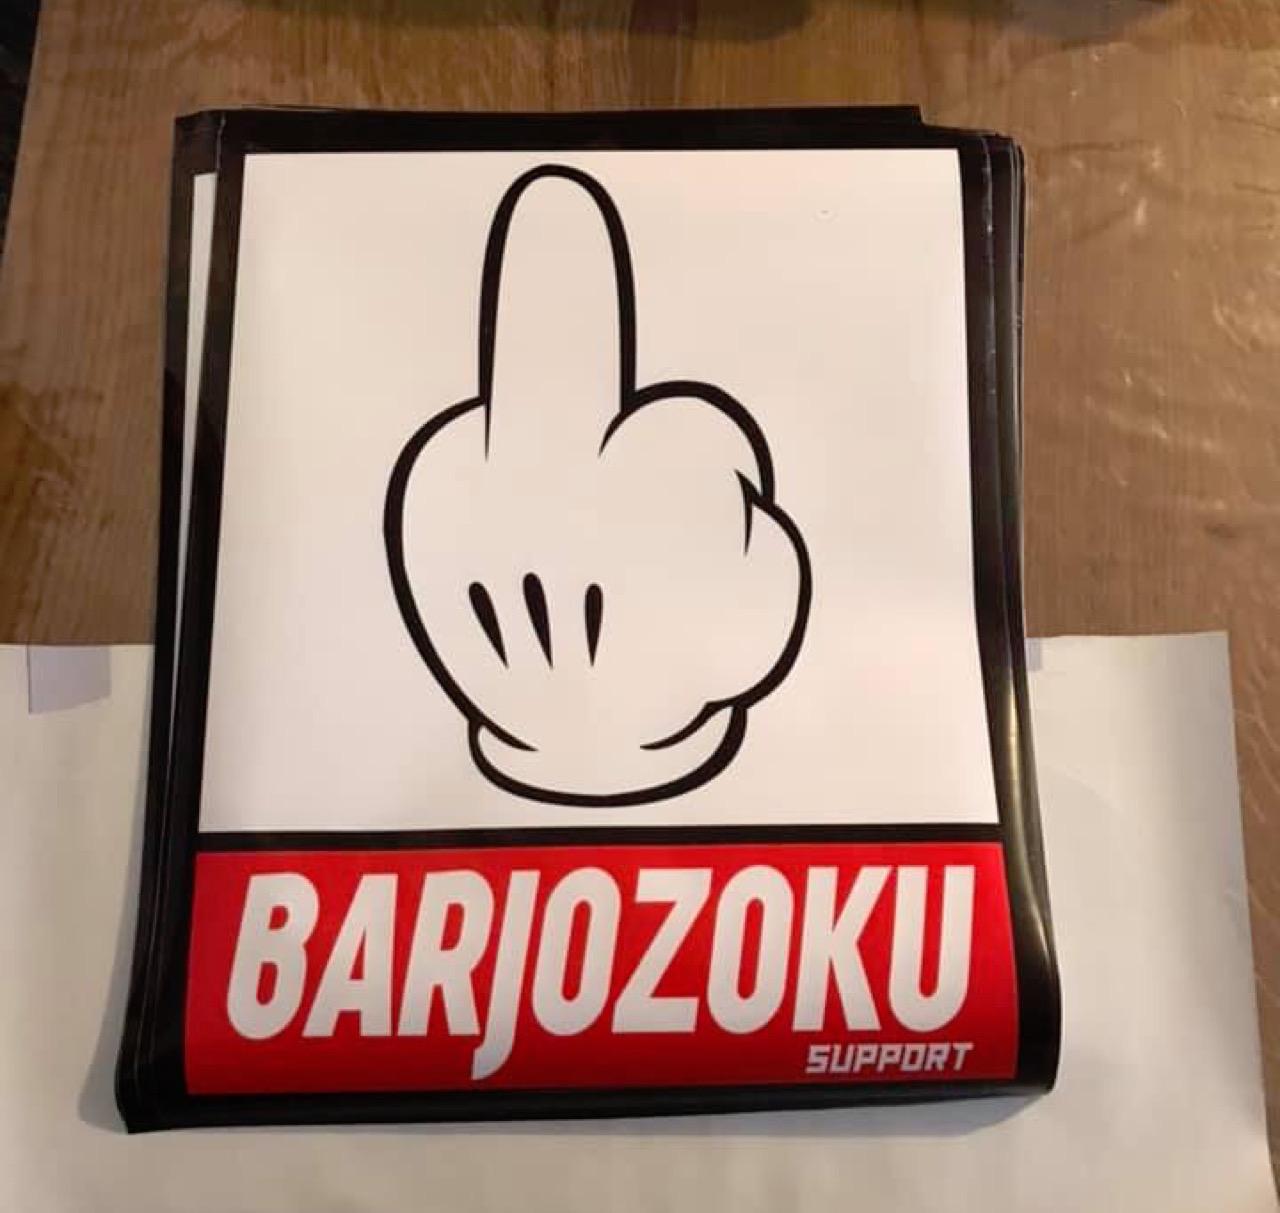 #Petrolhead : Ibra des Barjozoku... Vraiment barj' ?! 8